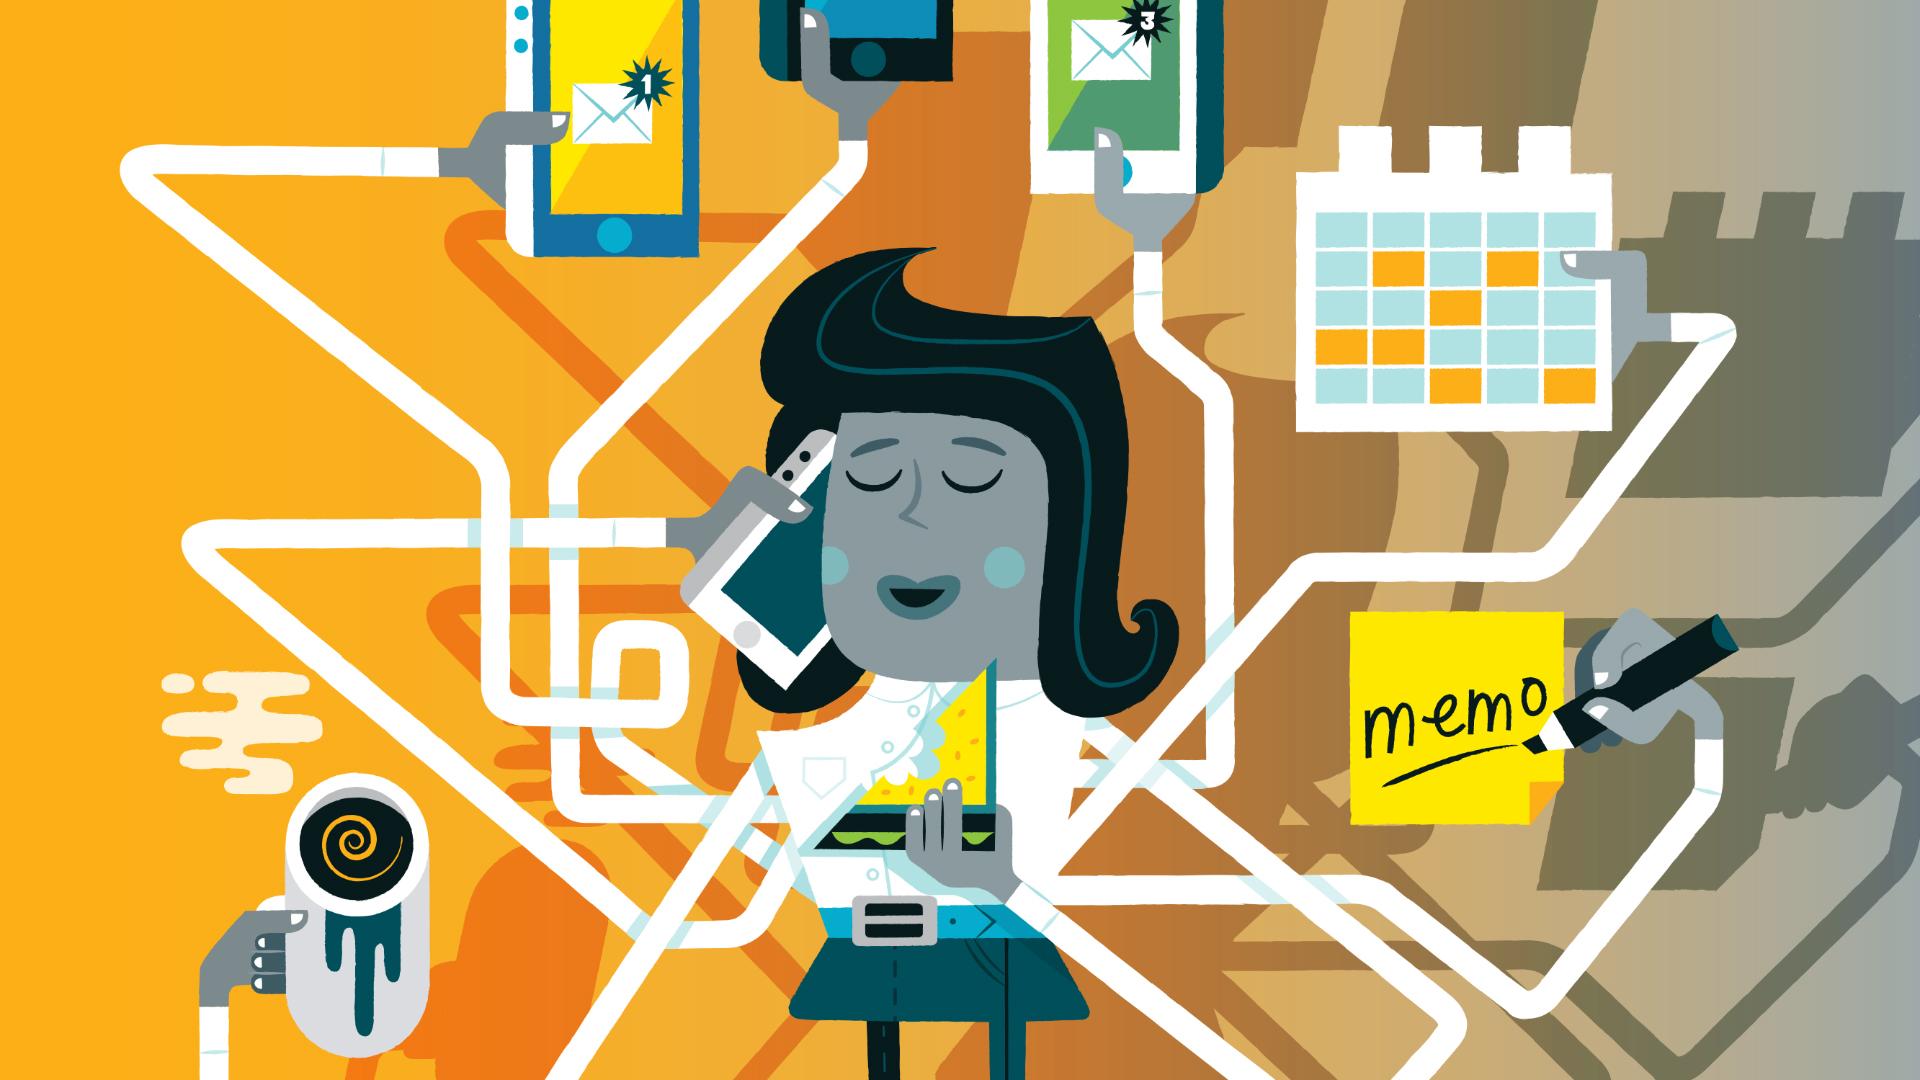 Rpoductivity illustration